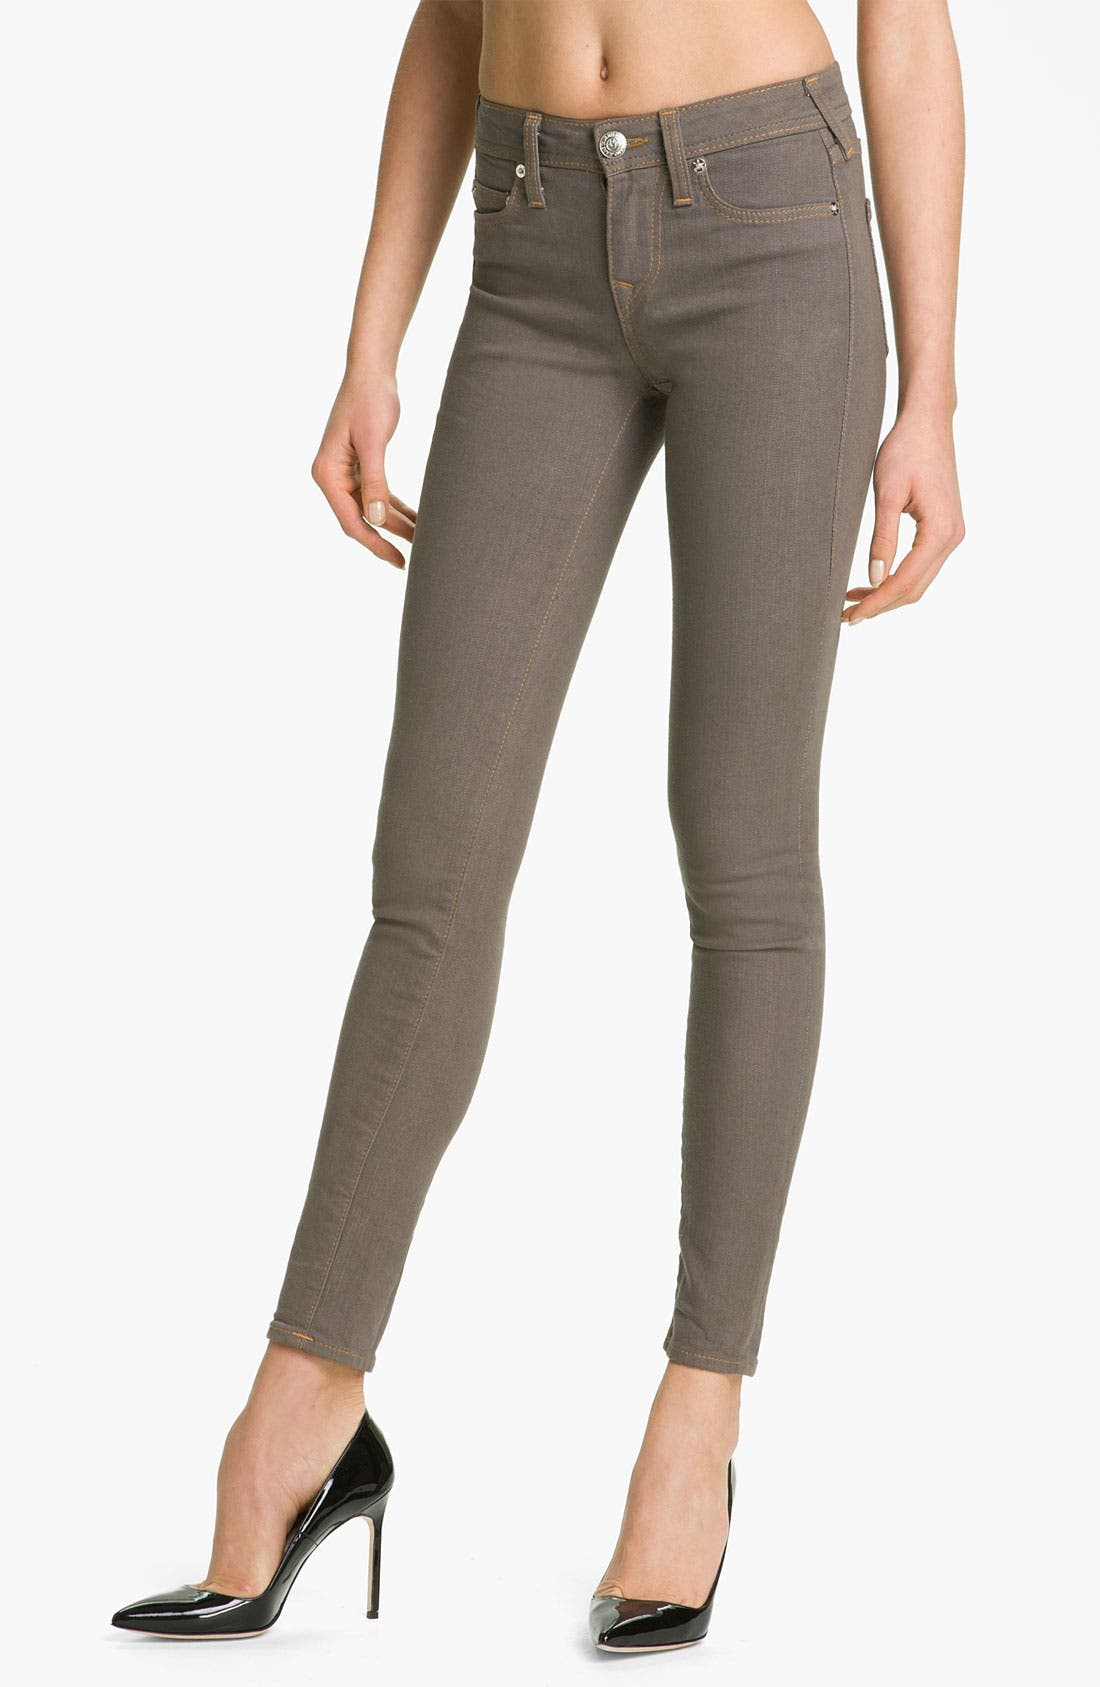 Main Image - True Religion Brand Jeans 'Halle' Skinny Stretch Jeans (Dark Storm)